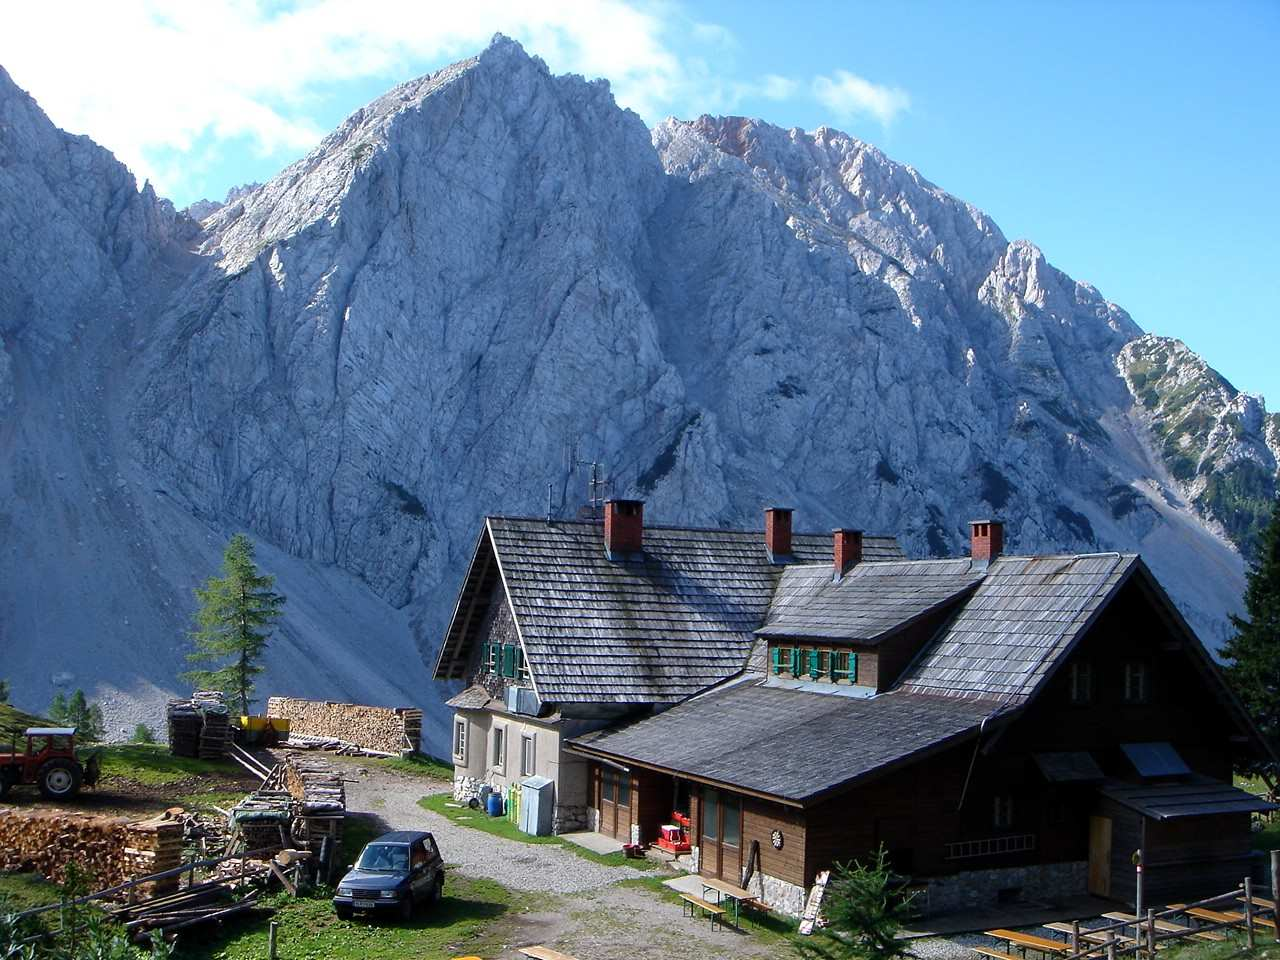 Foto: Manfred Karl / Wandertour / Über die Klagenfurter Hütte auf den Geißberg / Klagenfurter Hütte / 20.06.2007 18:10:31